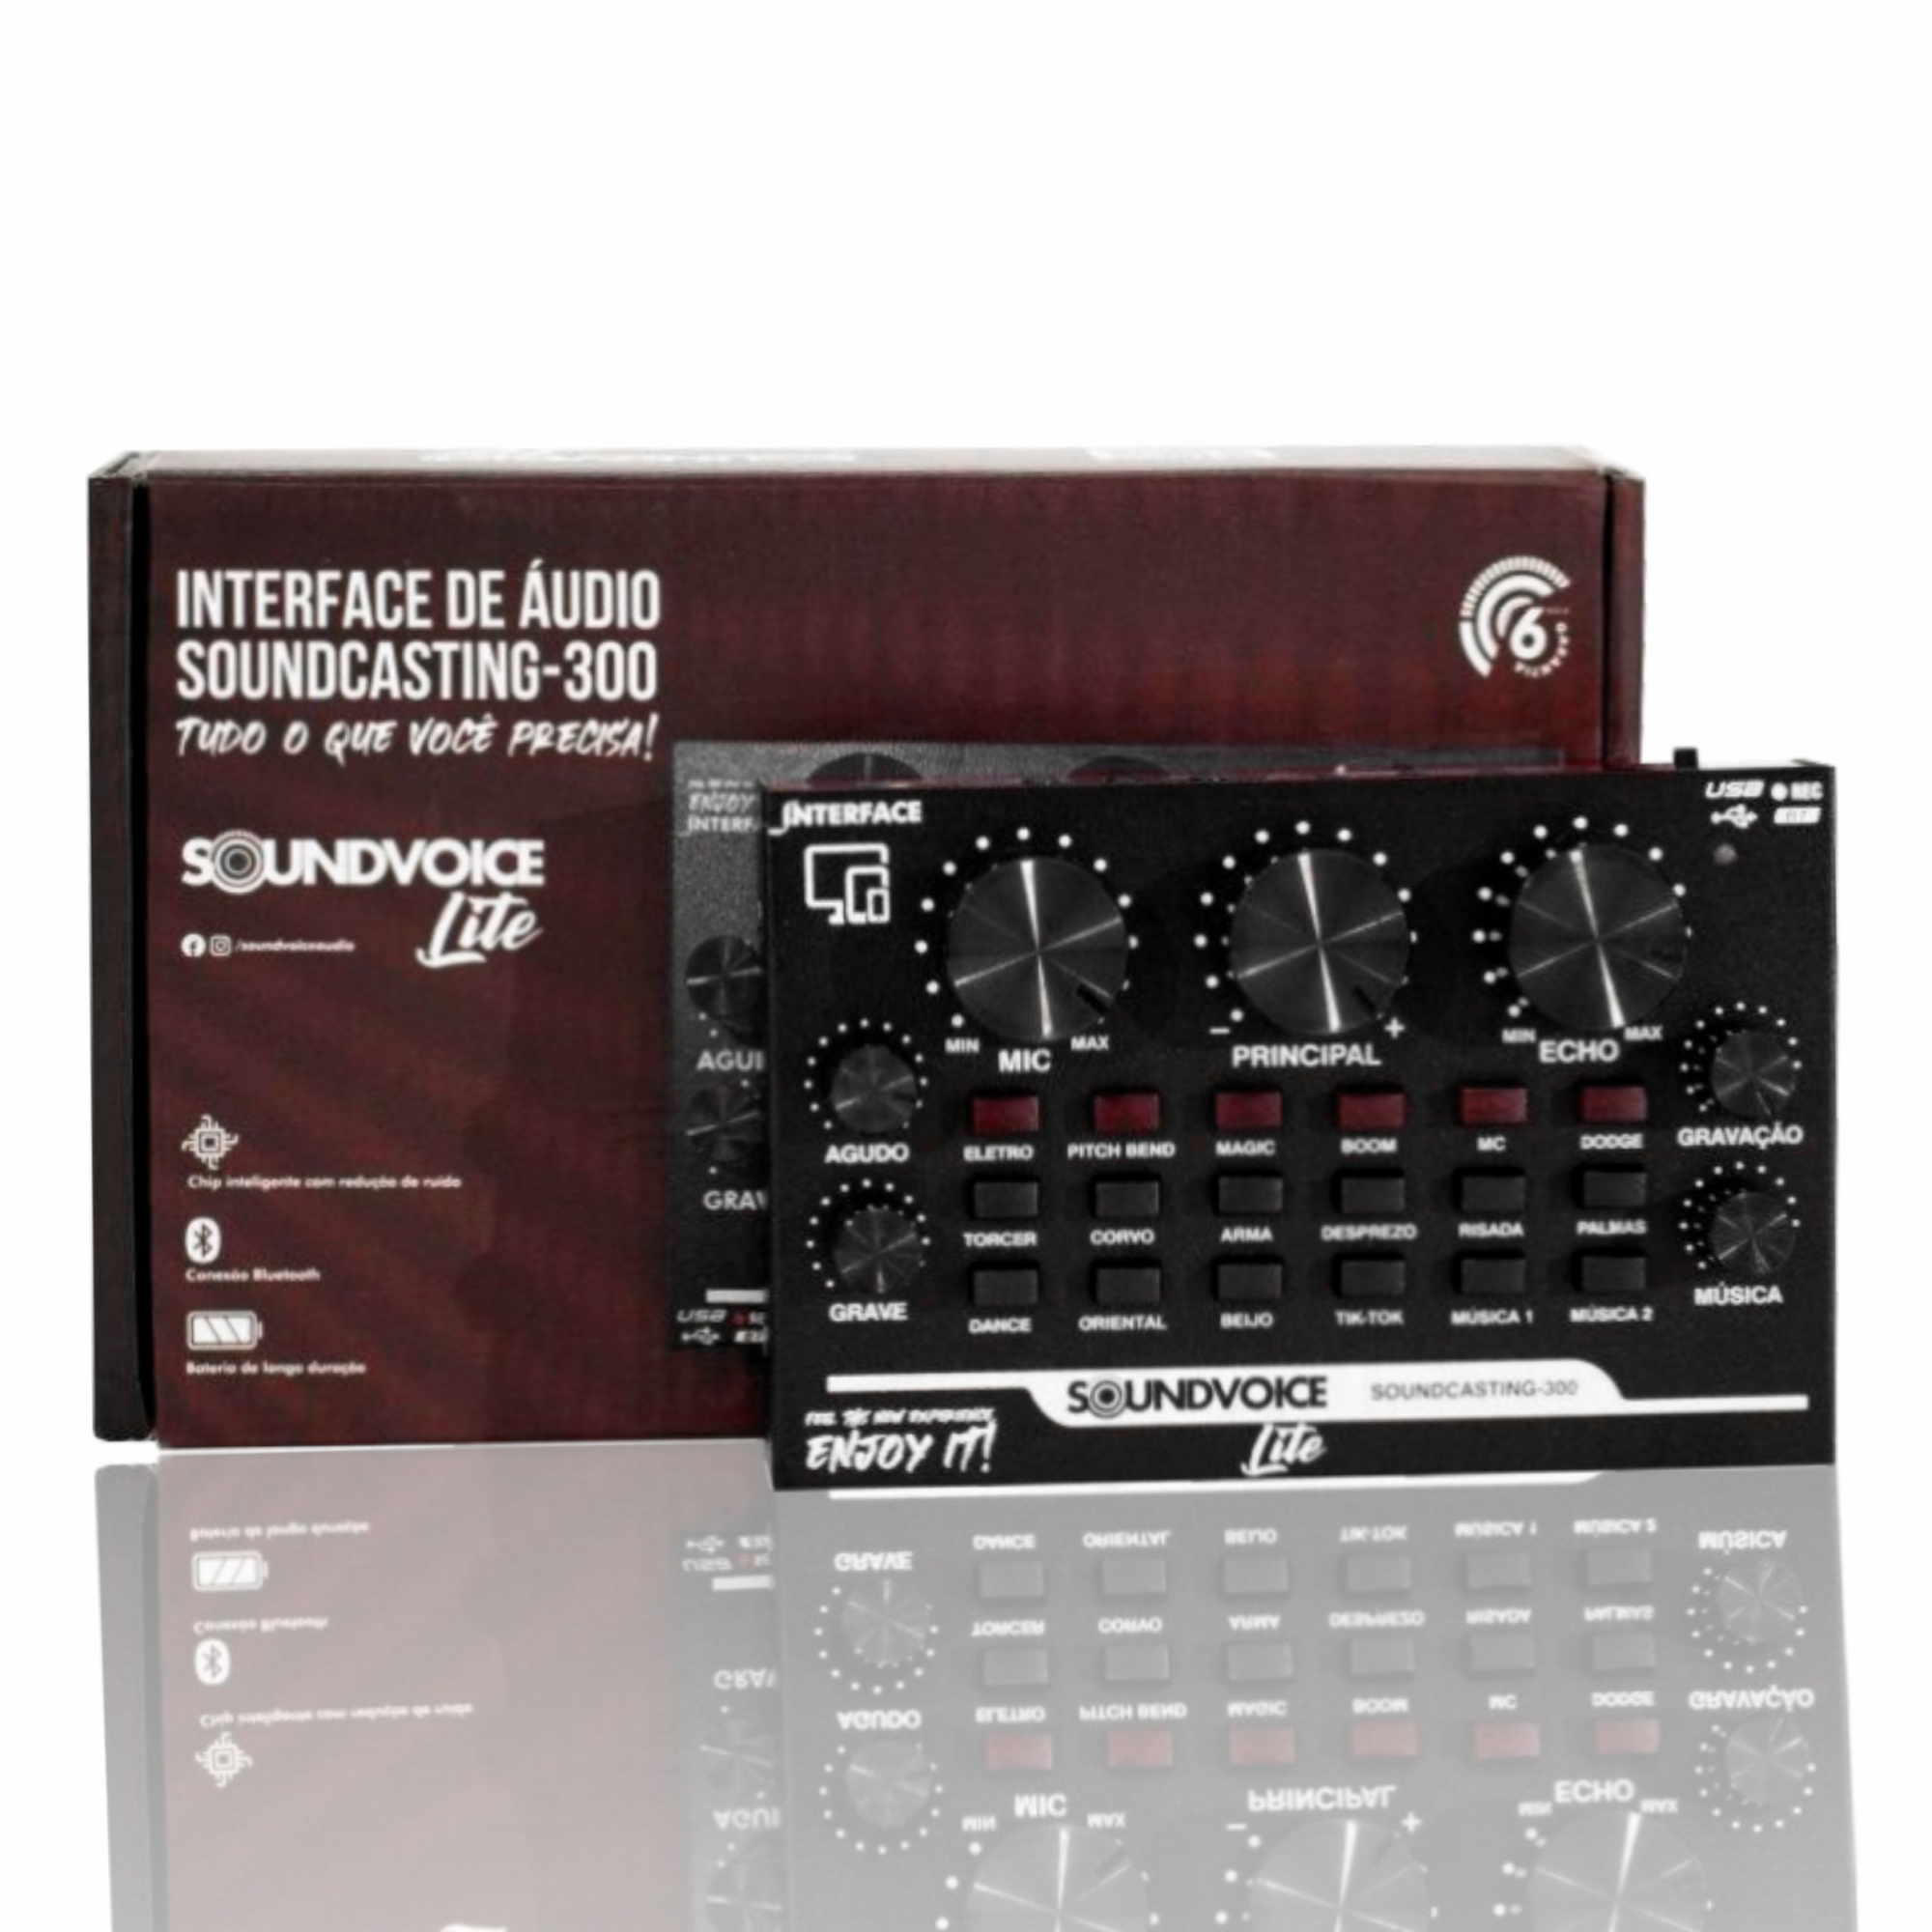 INTERFACE DE ÁUDIO SOUNDVOICE Soundcasting 300